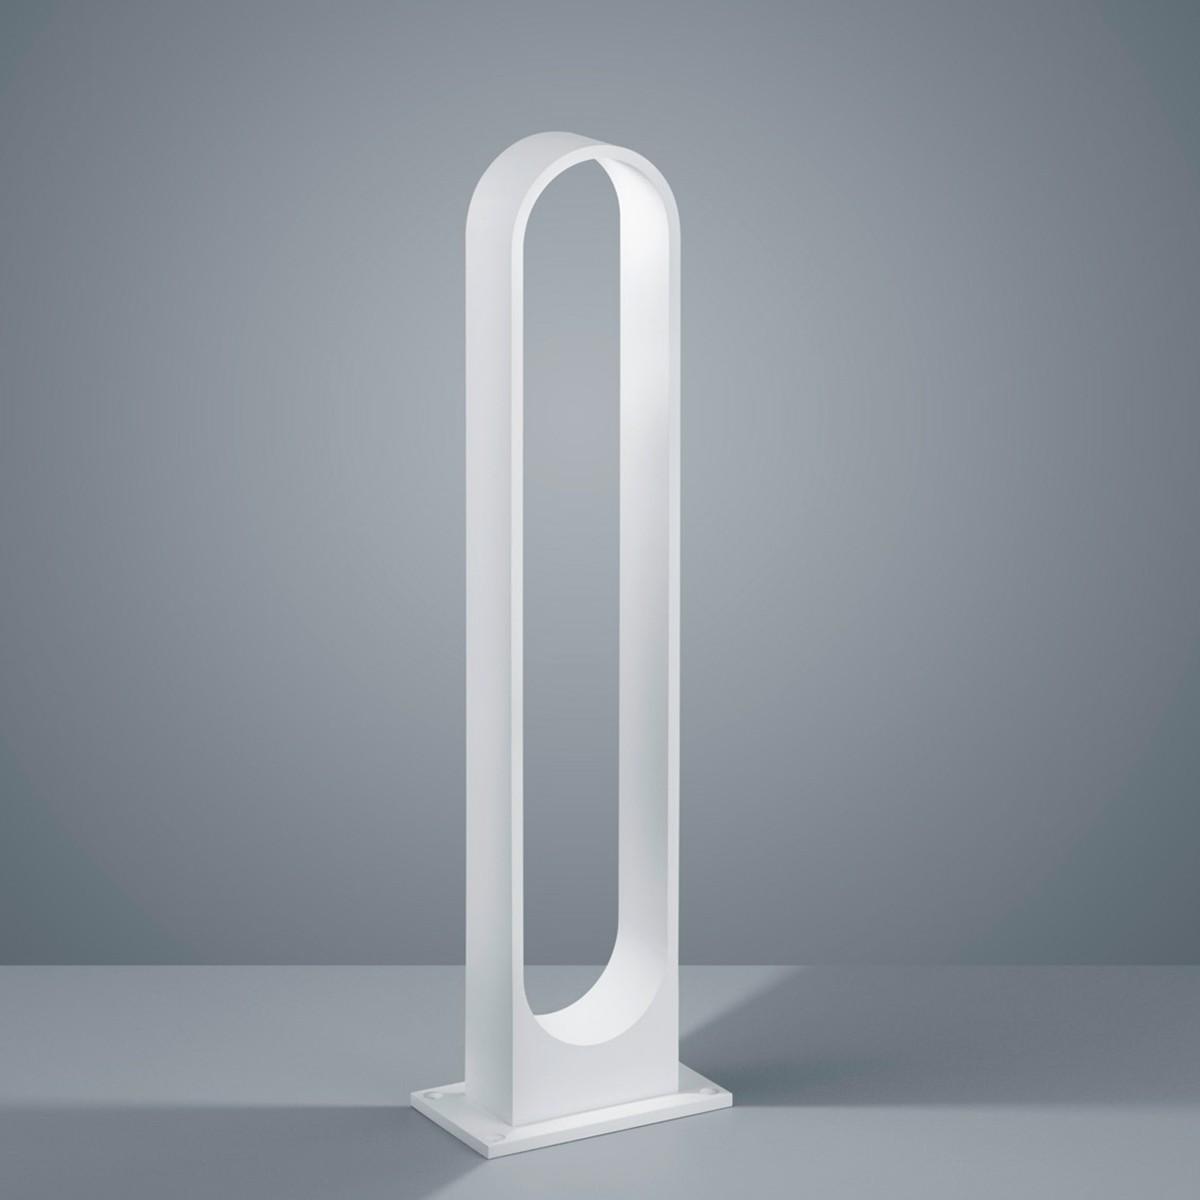 Helestra Dry LED Pollerleuchte, weiß matt